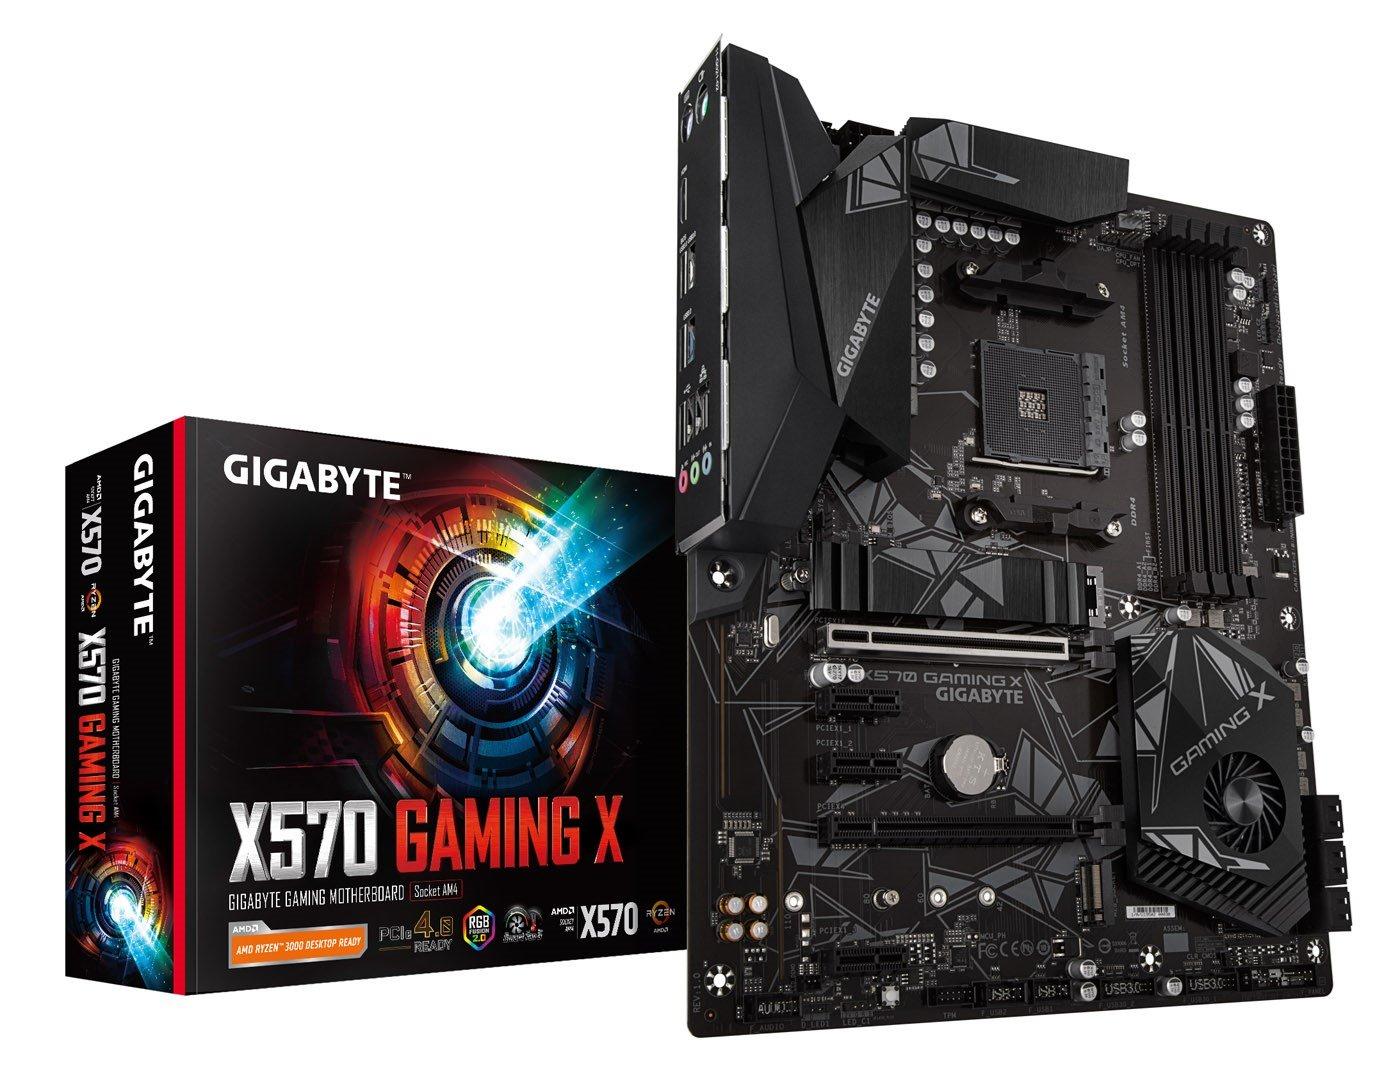 Gigabyte X570 GAMING X AMD Socket AM4 Motherboard £139.99 at CCL